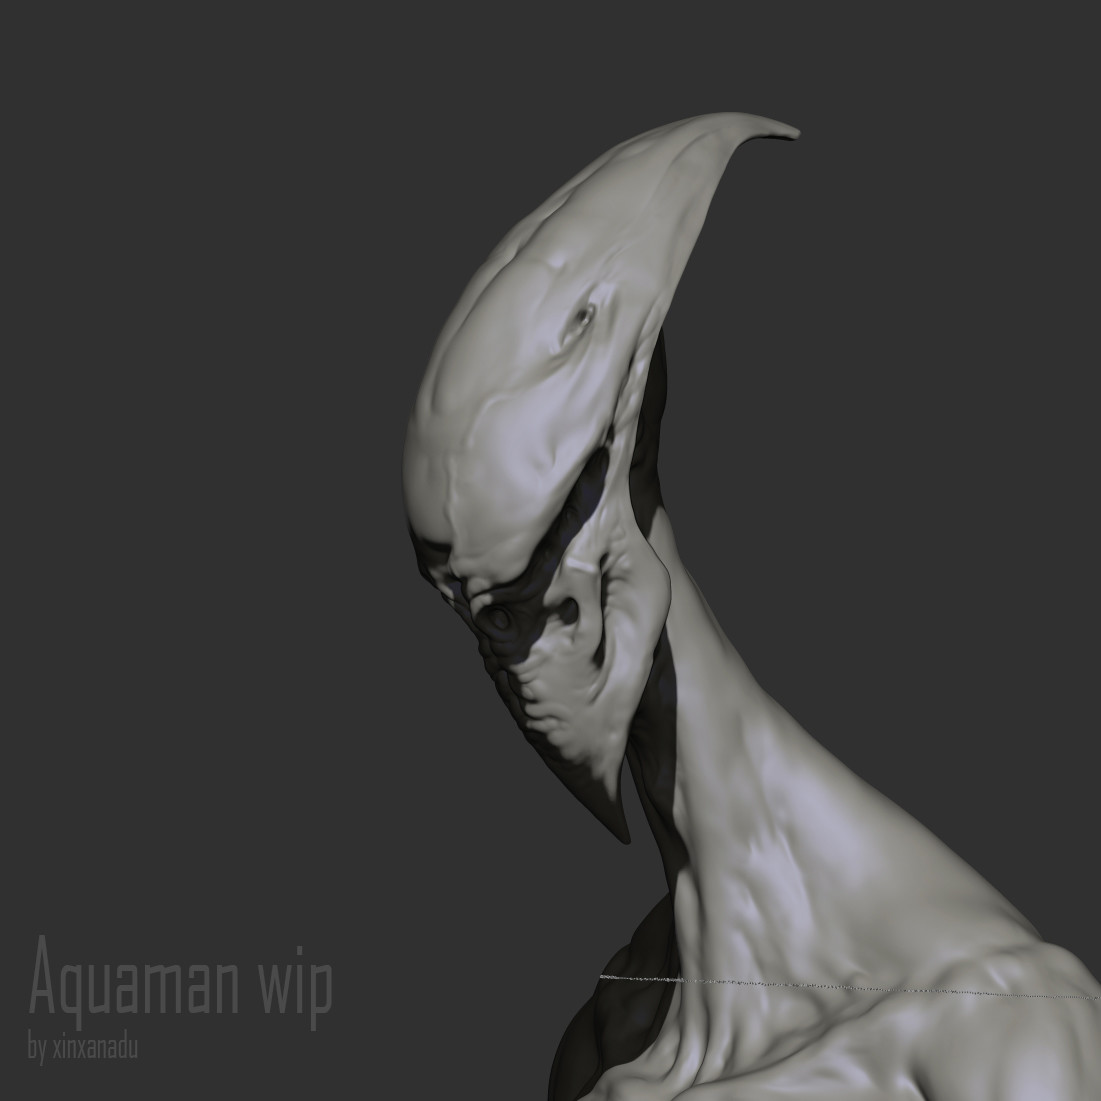 Xin wang aquaman test02